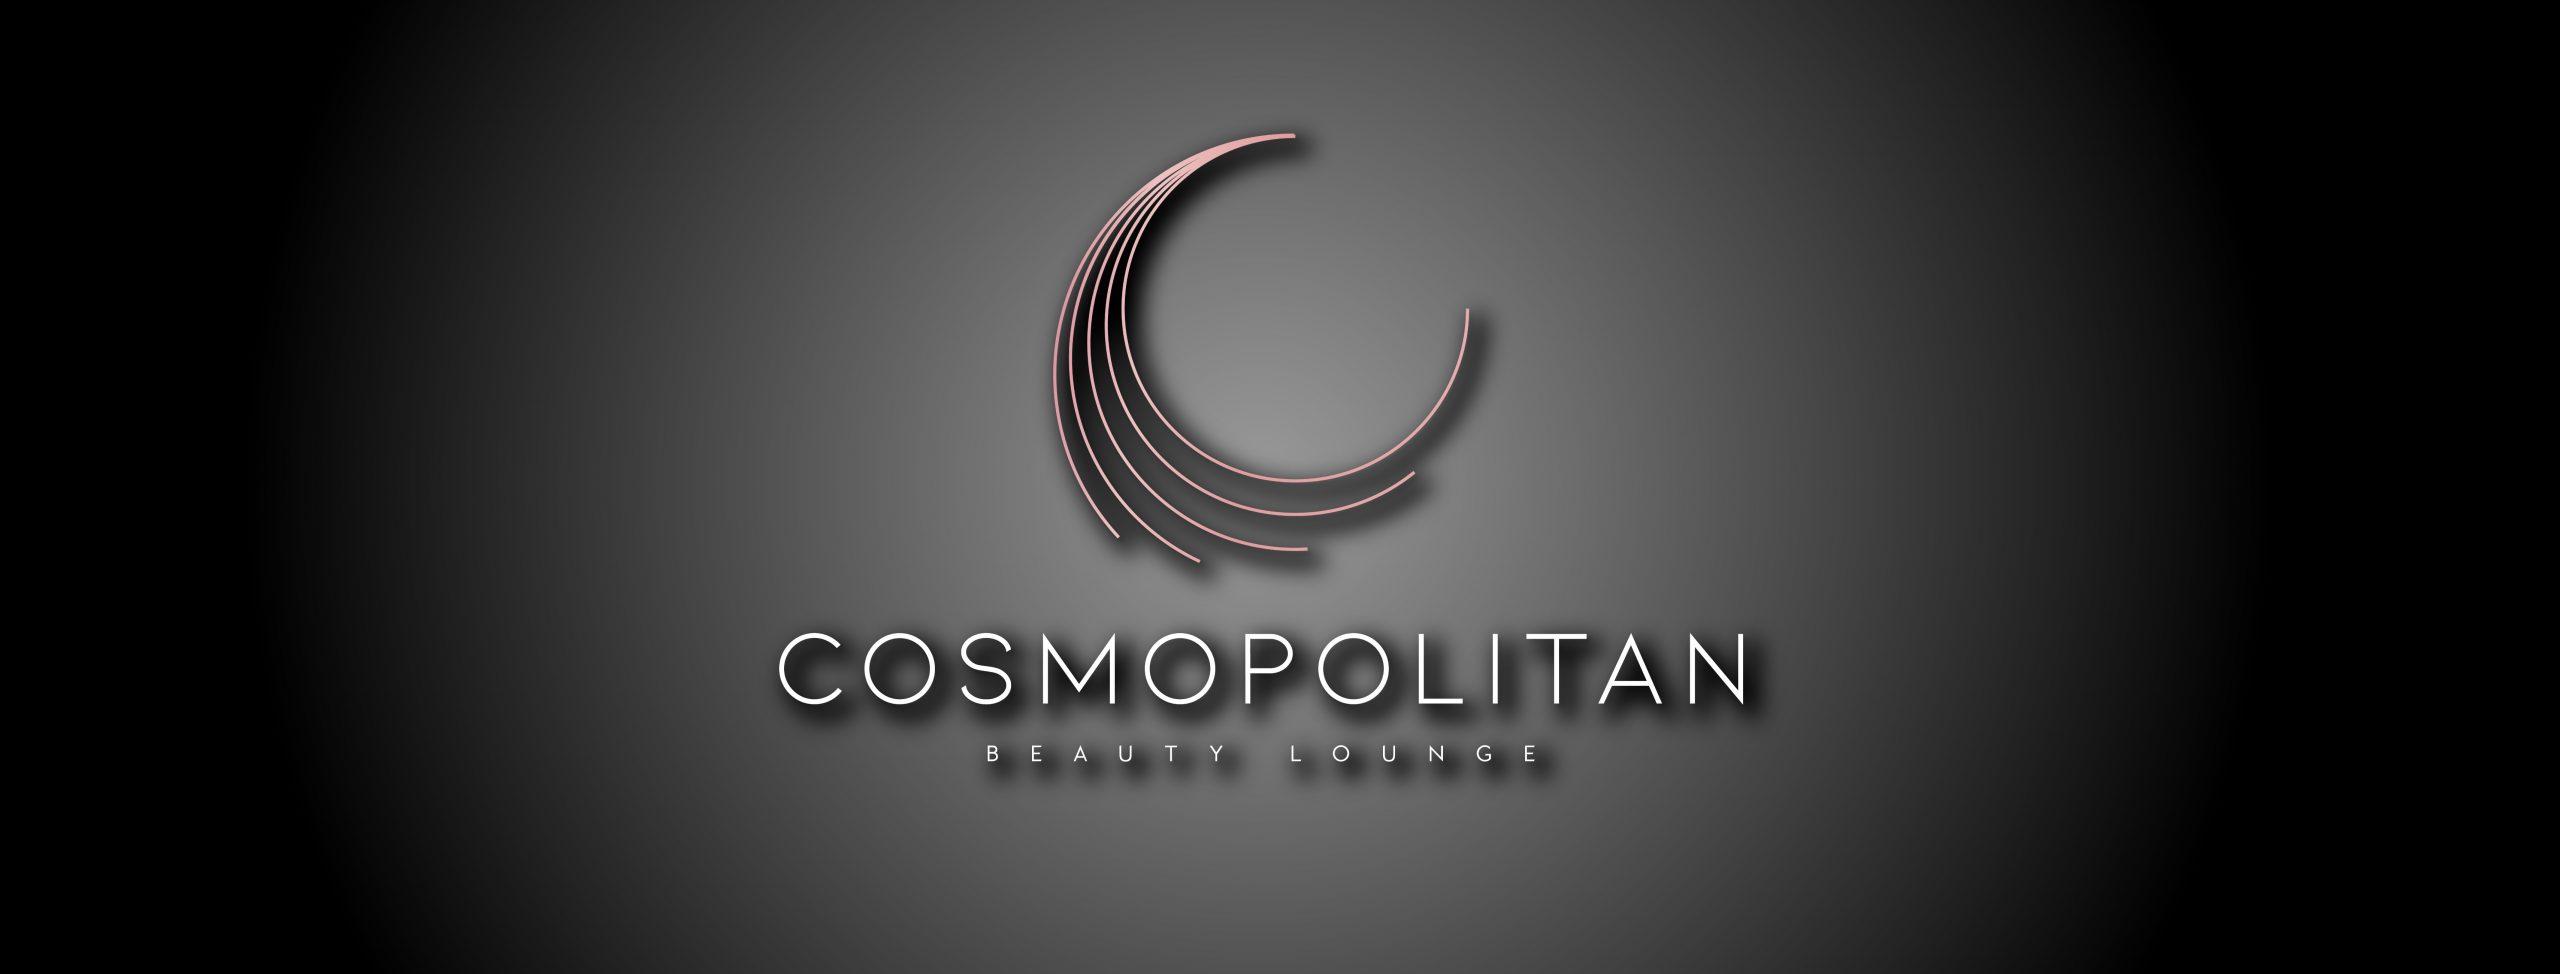 Cosmopolitan Beauty Lounge